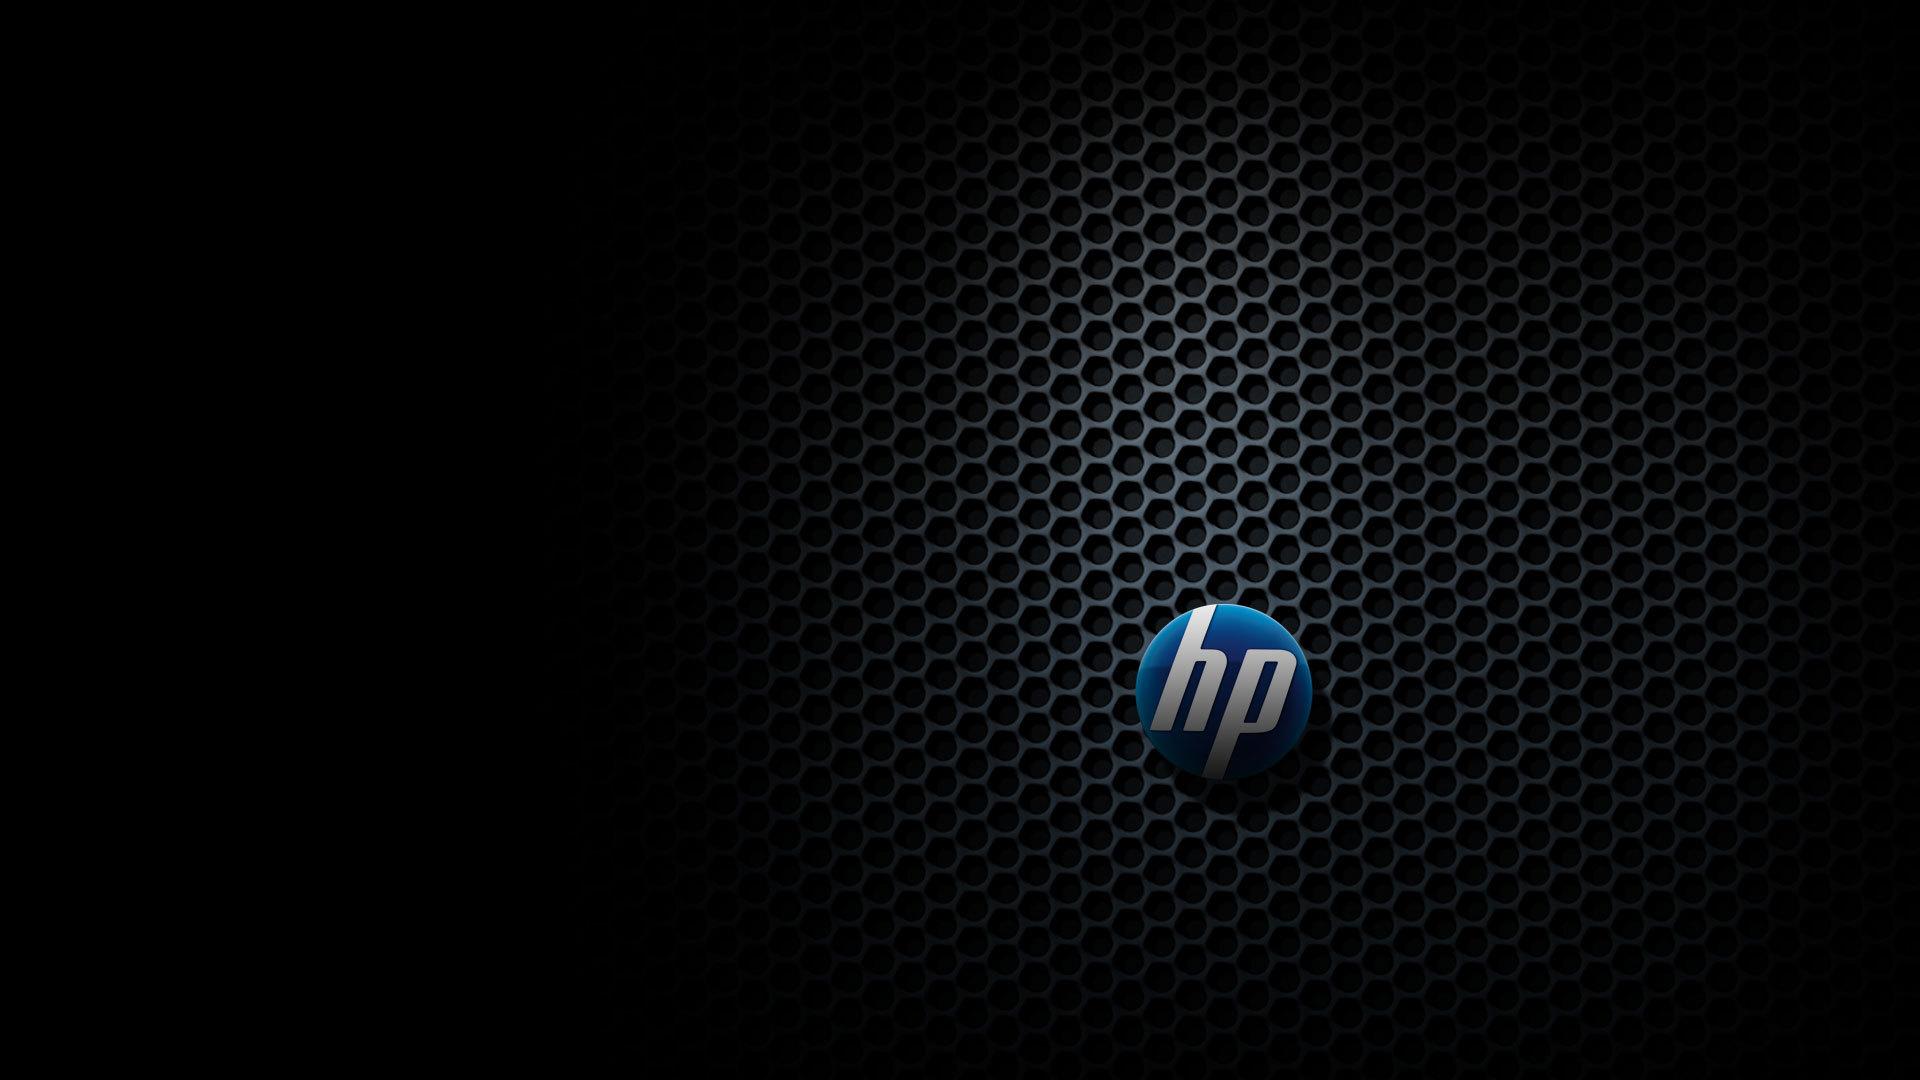 hp logo blue hd - photo #23